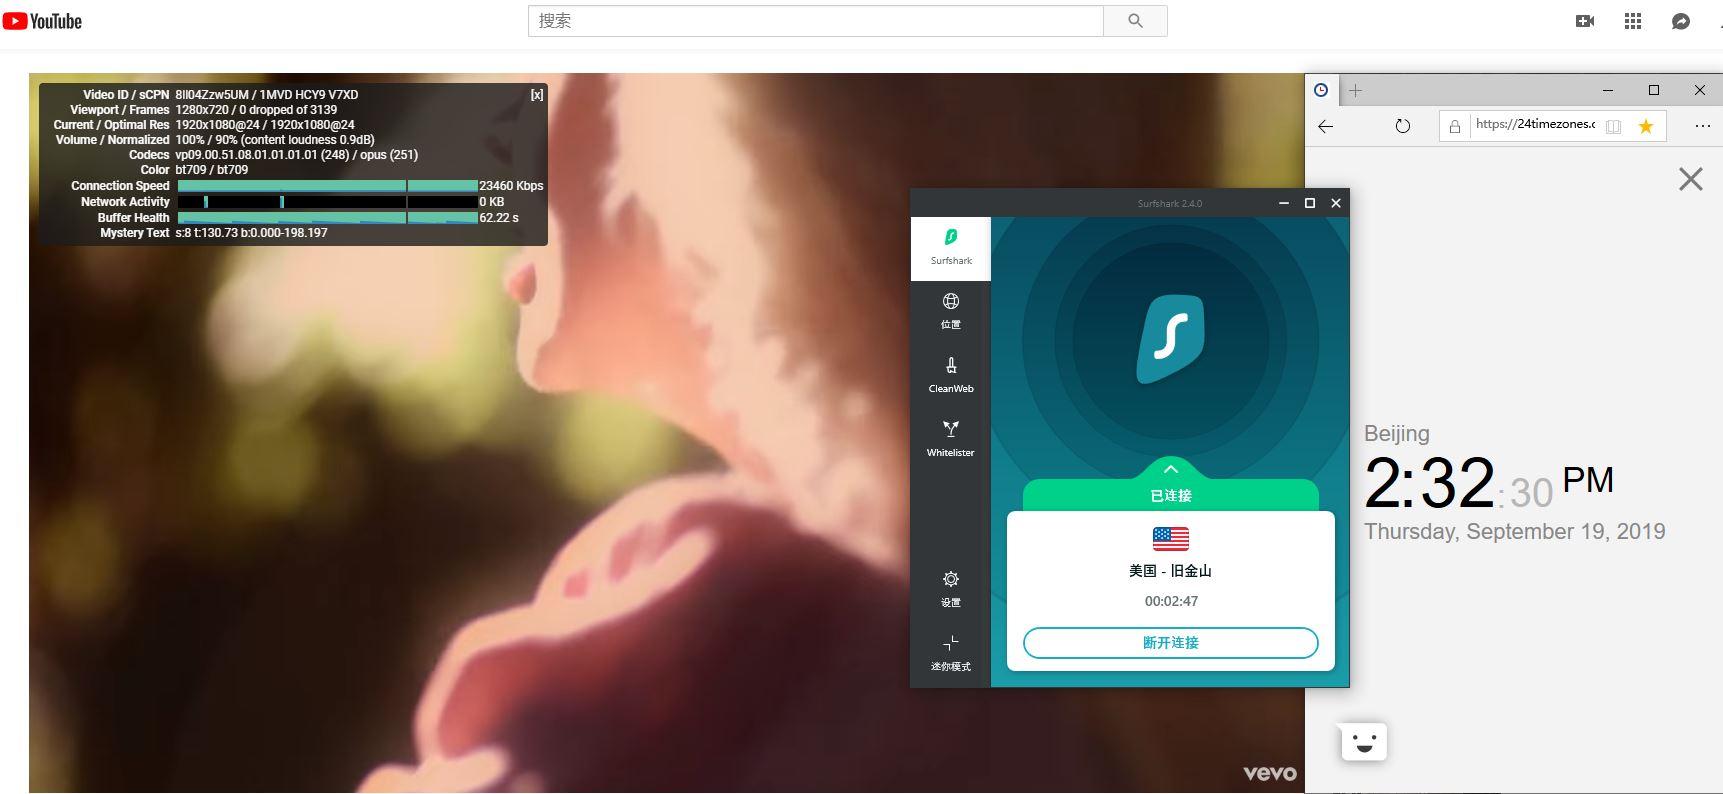 Windows SurfsharkVPN 美国 旧金山 服务器 中国VPN翻墙 科学上网 YouTube连接速度-20190919